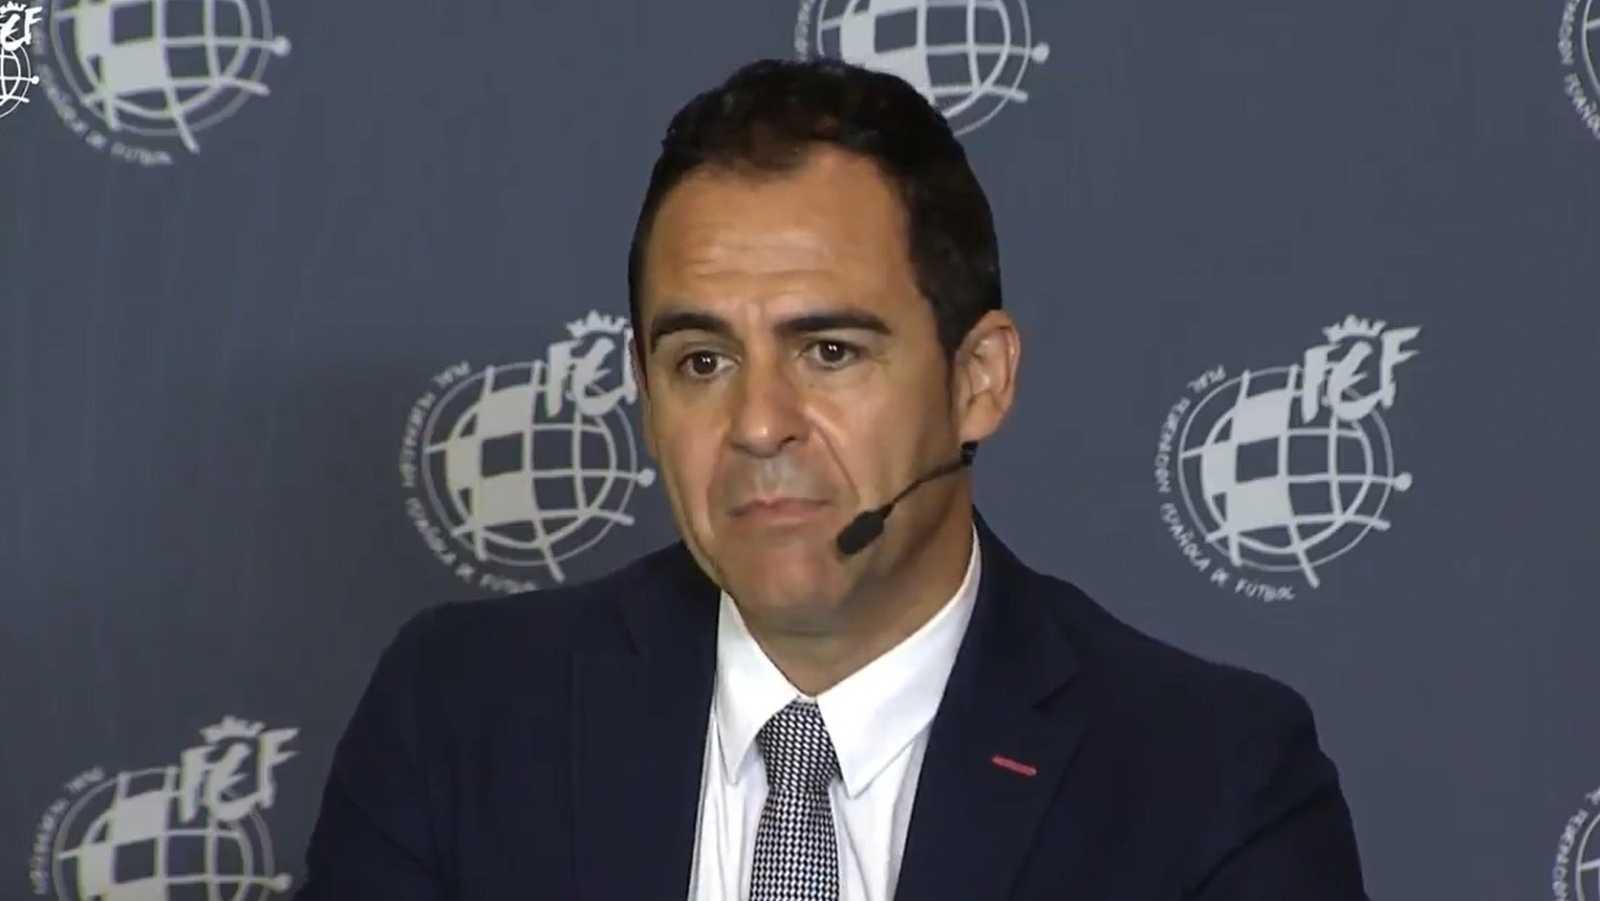 Velasco Carballo